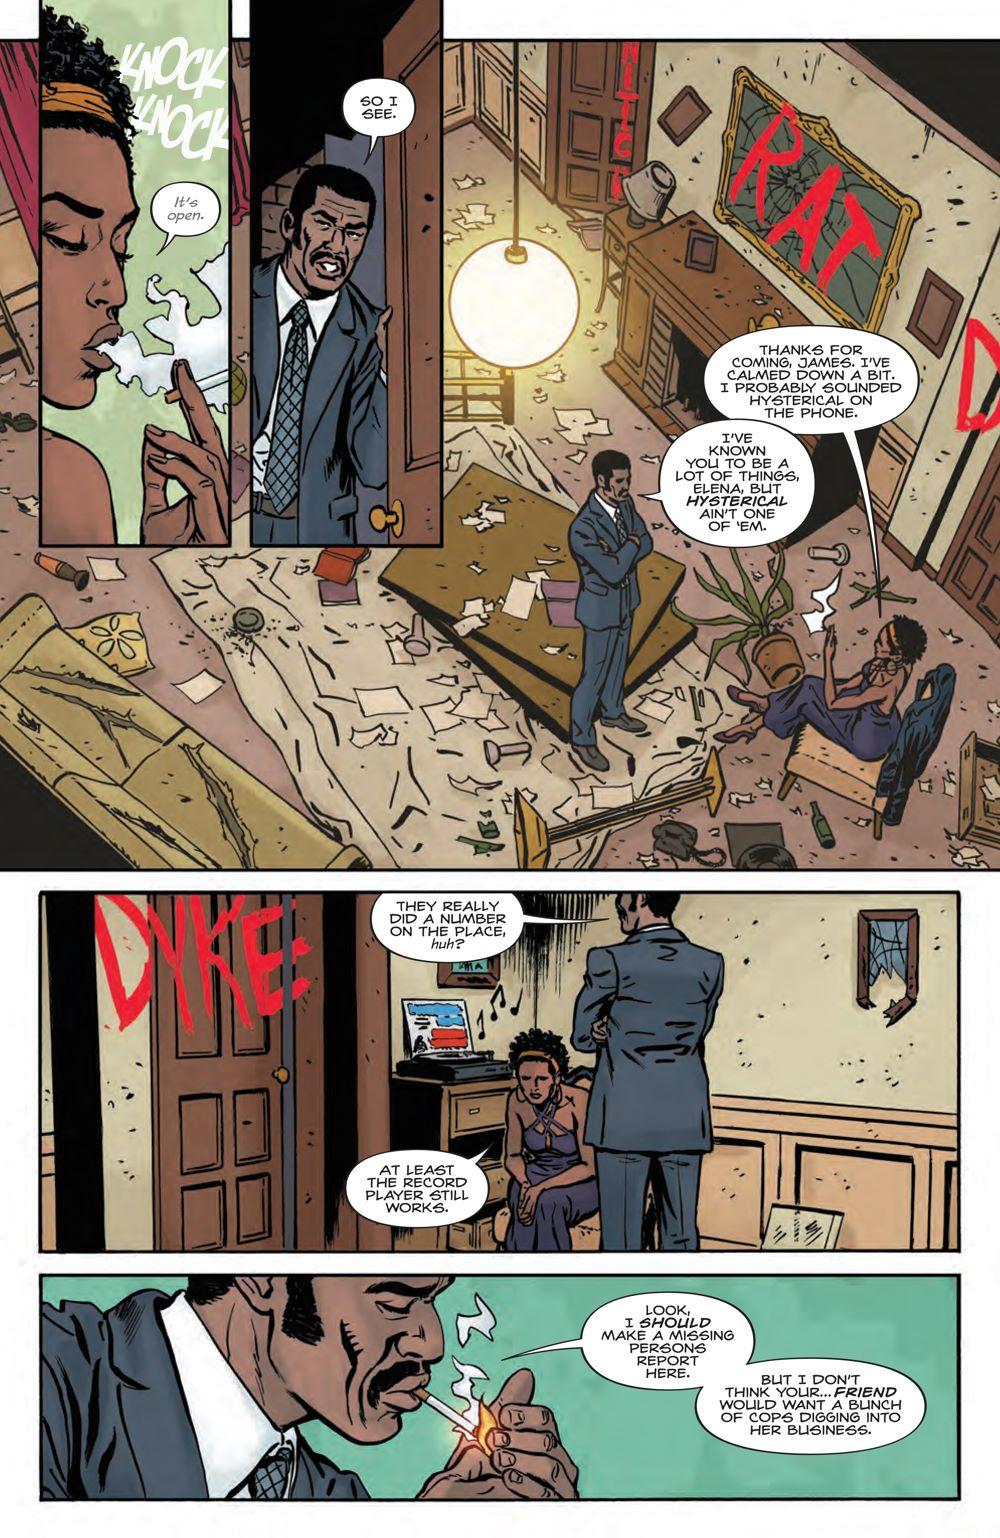 Abbott_1973_003_PRESS_4 ComicList Previews: ABBOTT 1973 #3 (OF 5)